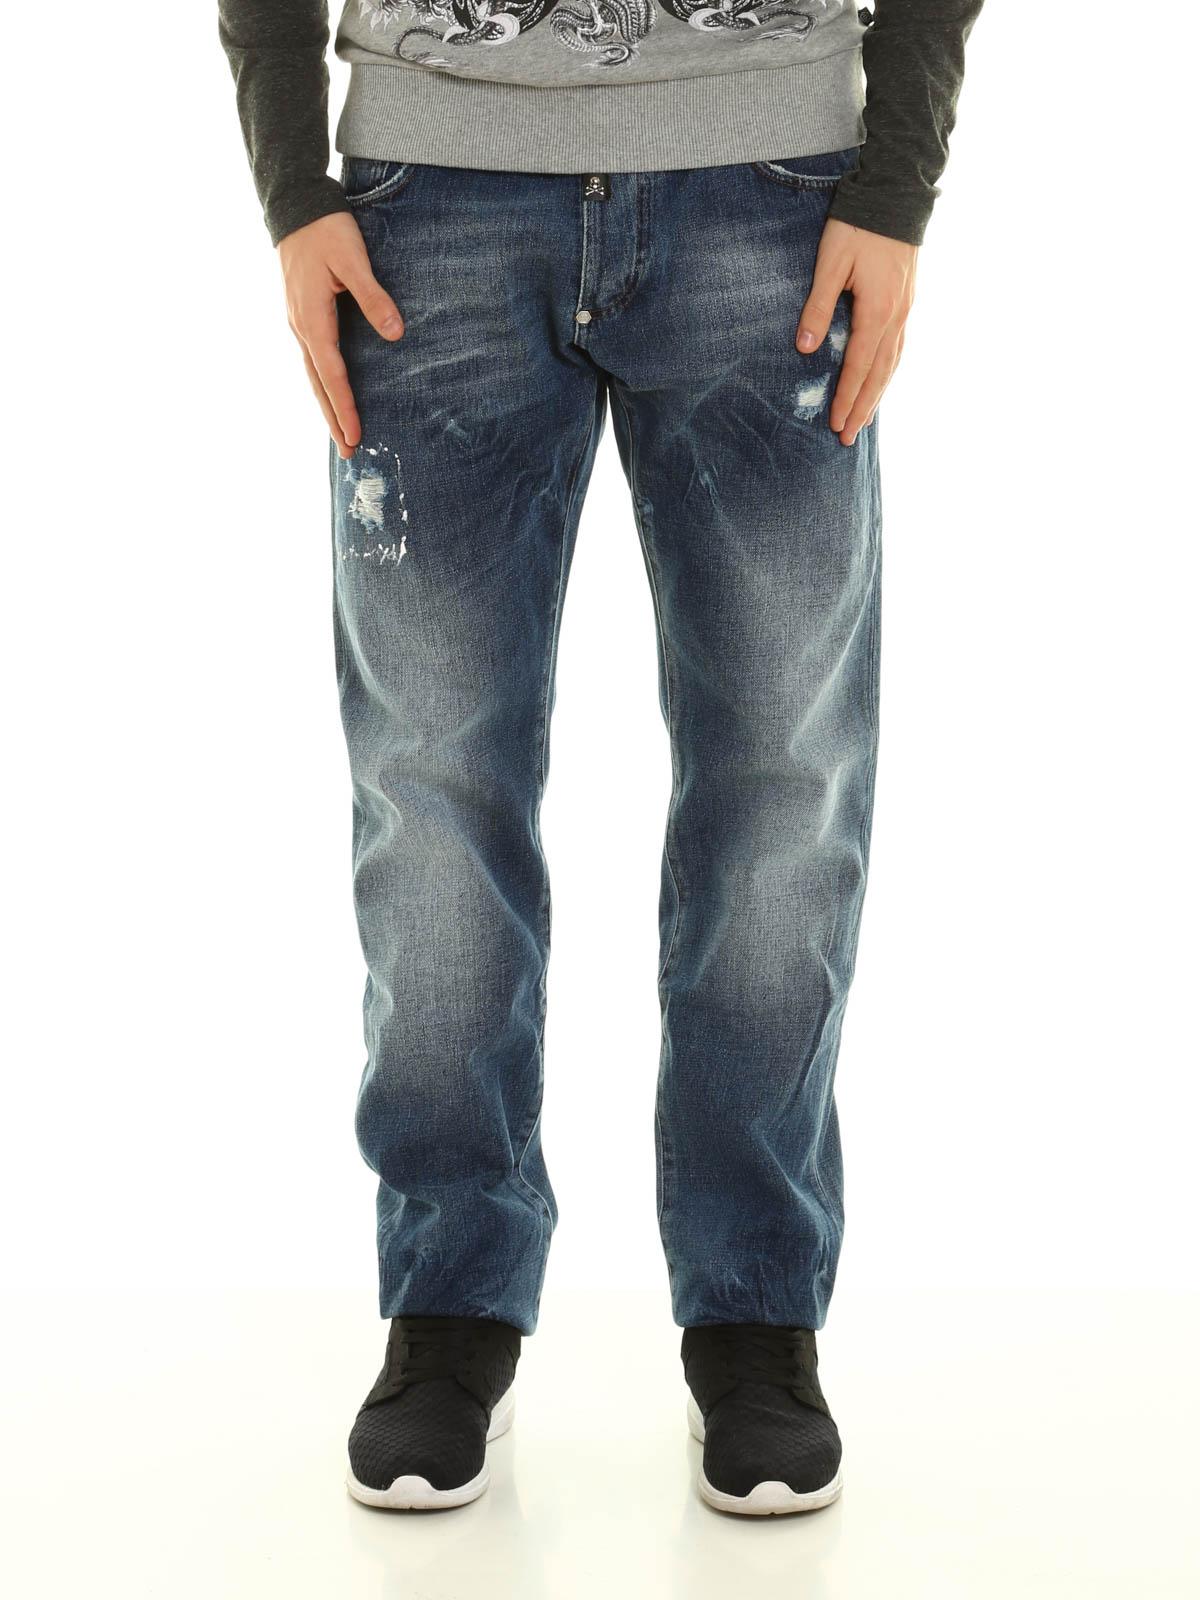 basic rider denim jeans by philipp plein straight leg jeans ikrix. Black Bedroom Furniture Sets. Home Design Ideas